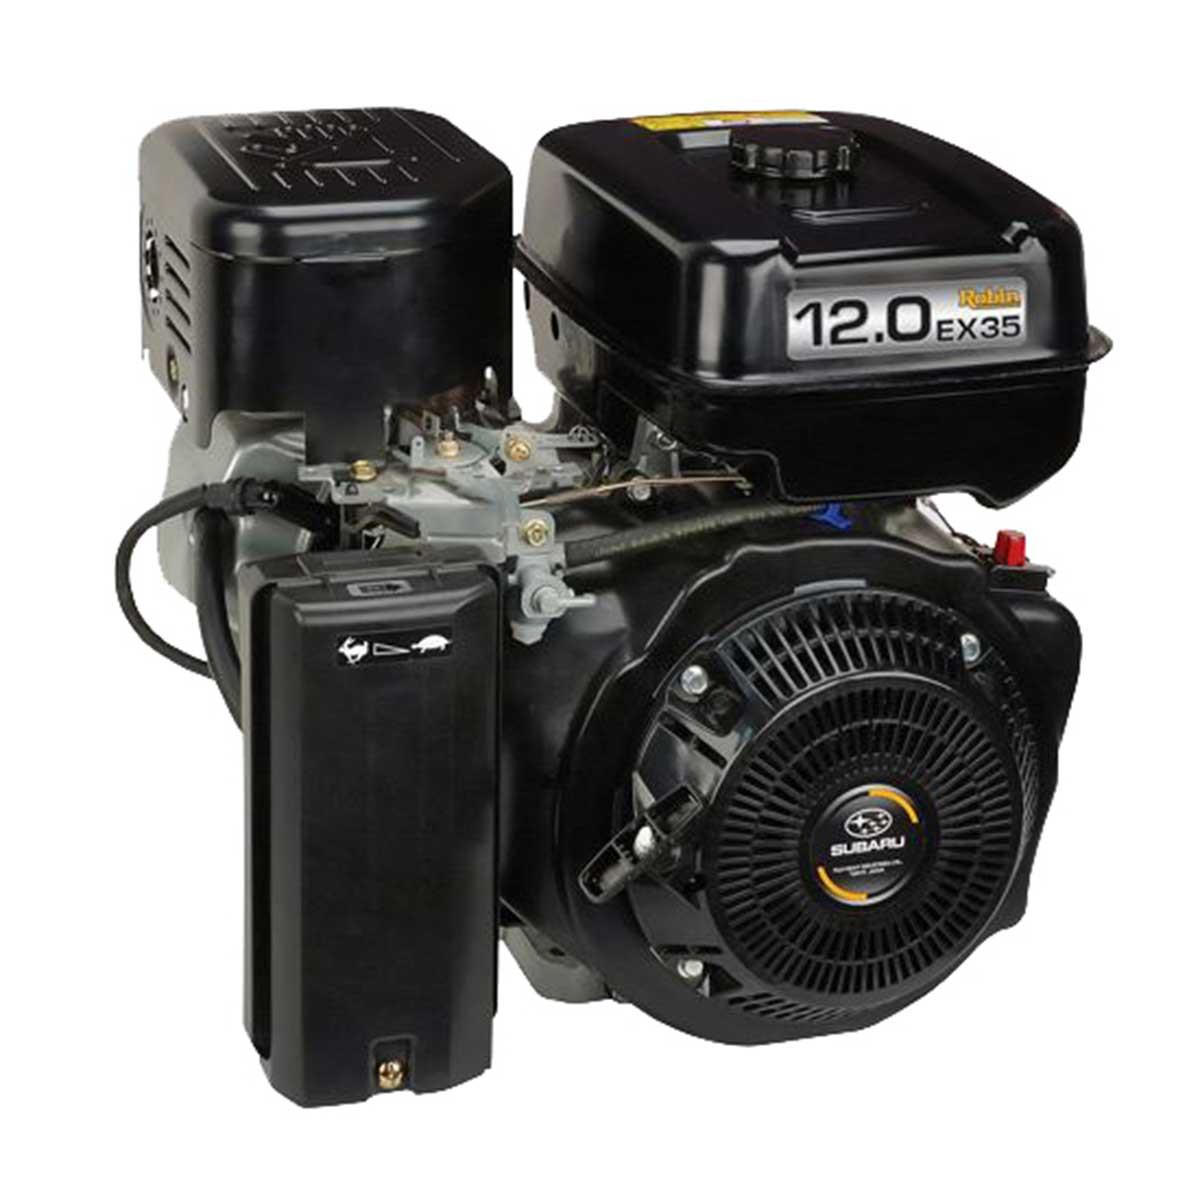 RGX6500 Subaru portable generator